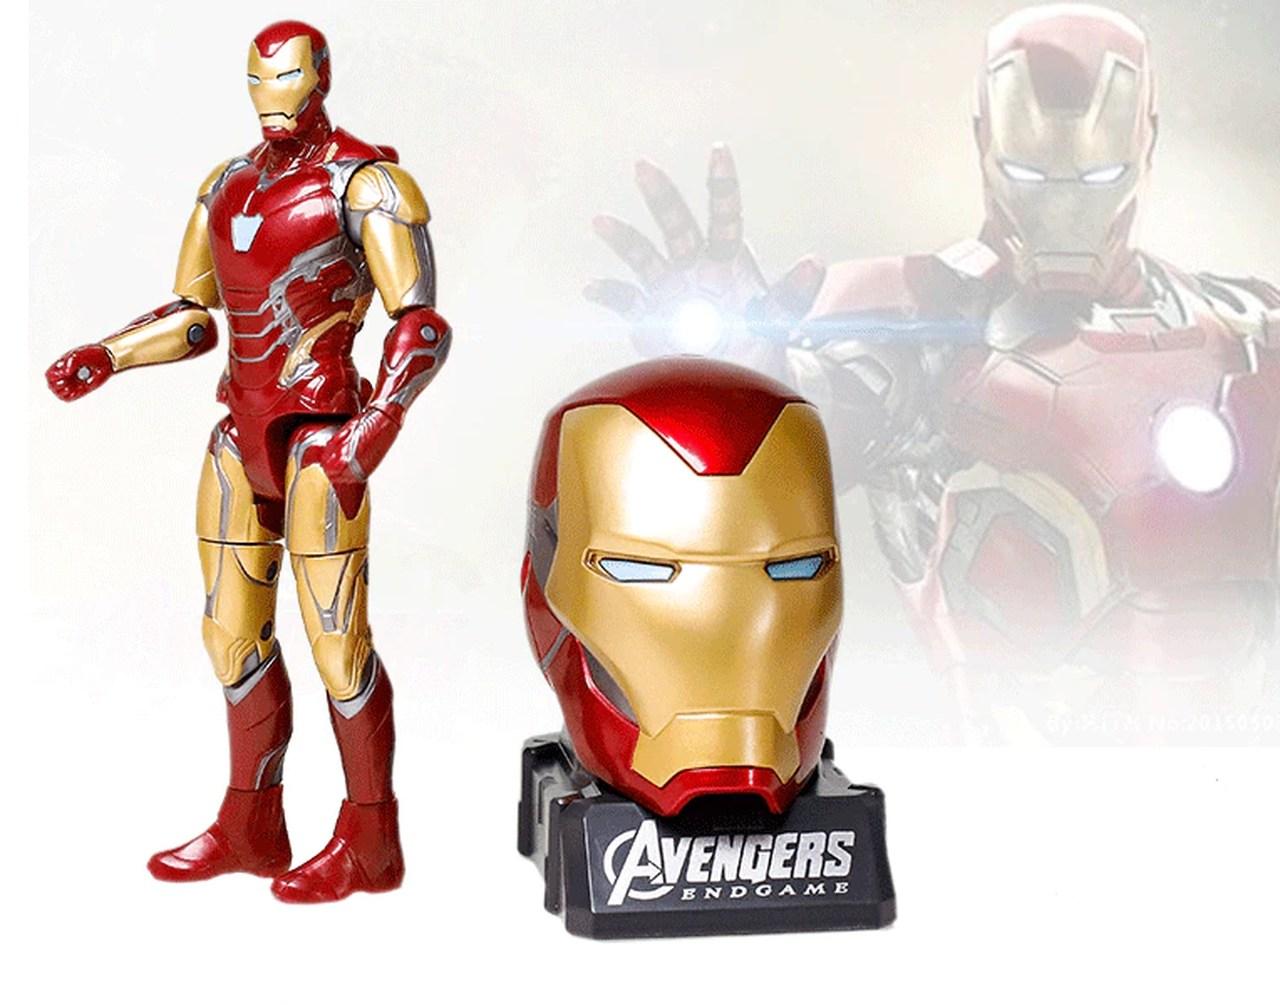 Action Figure Homem de Ferro Iron Man: Vingadores Ultimato Avengers End Game - Marvel - MKP